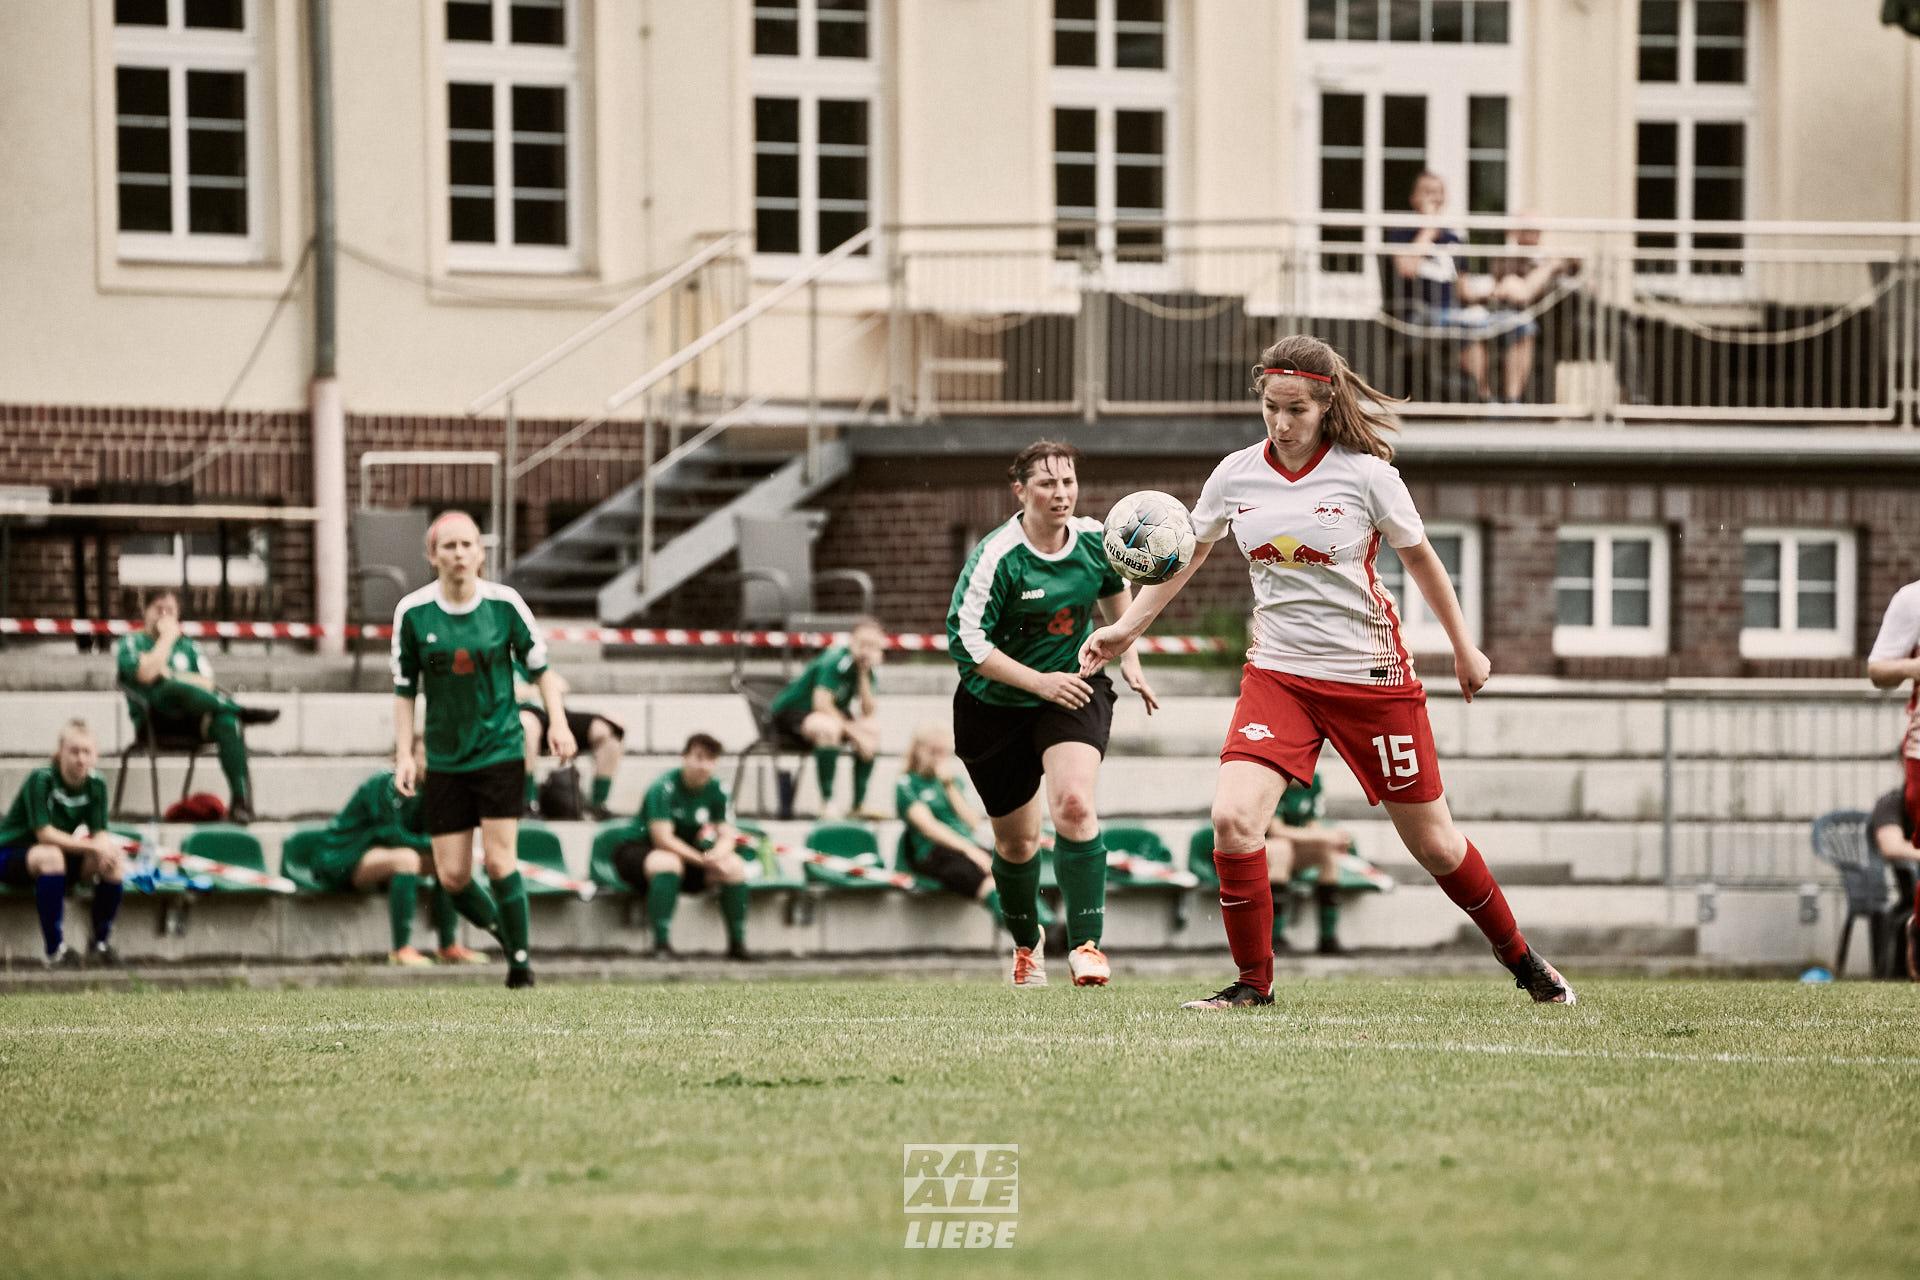 Testspiel: Eintracht Leipzig-Süd -vs- RB Leipzig II